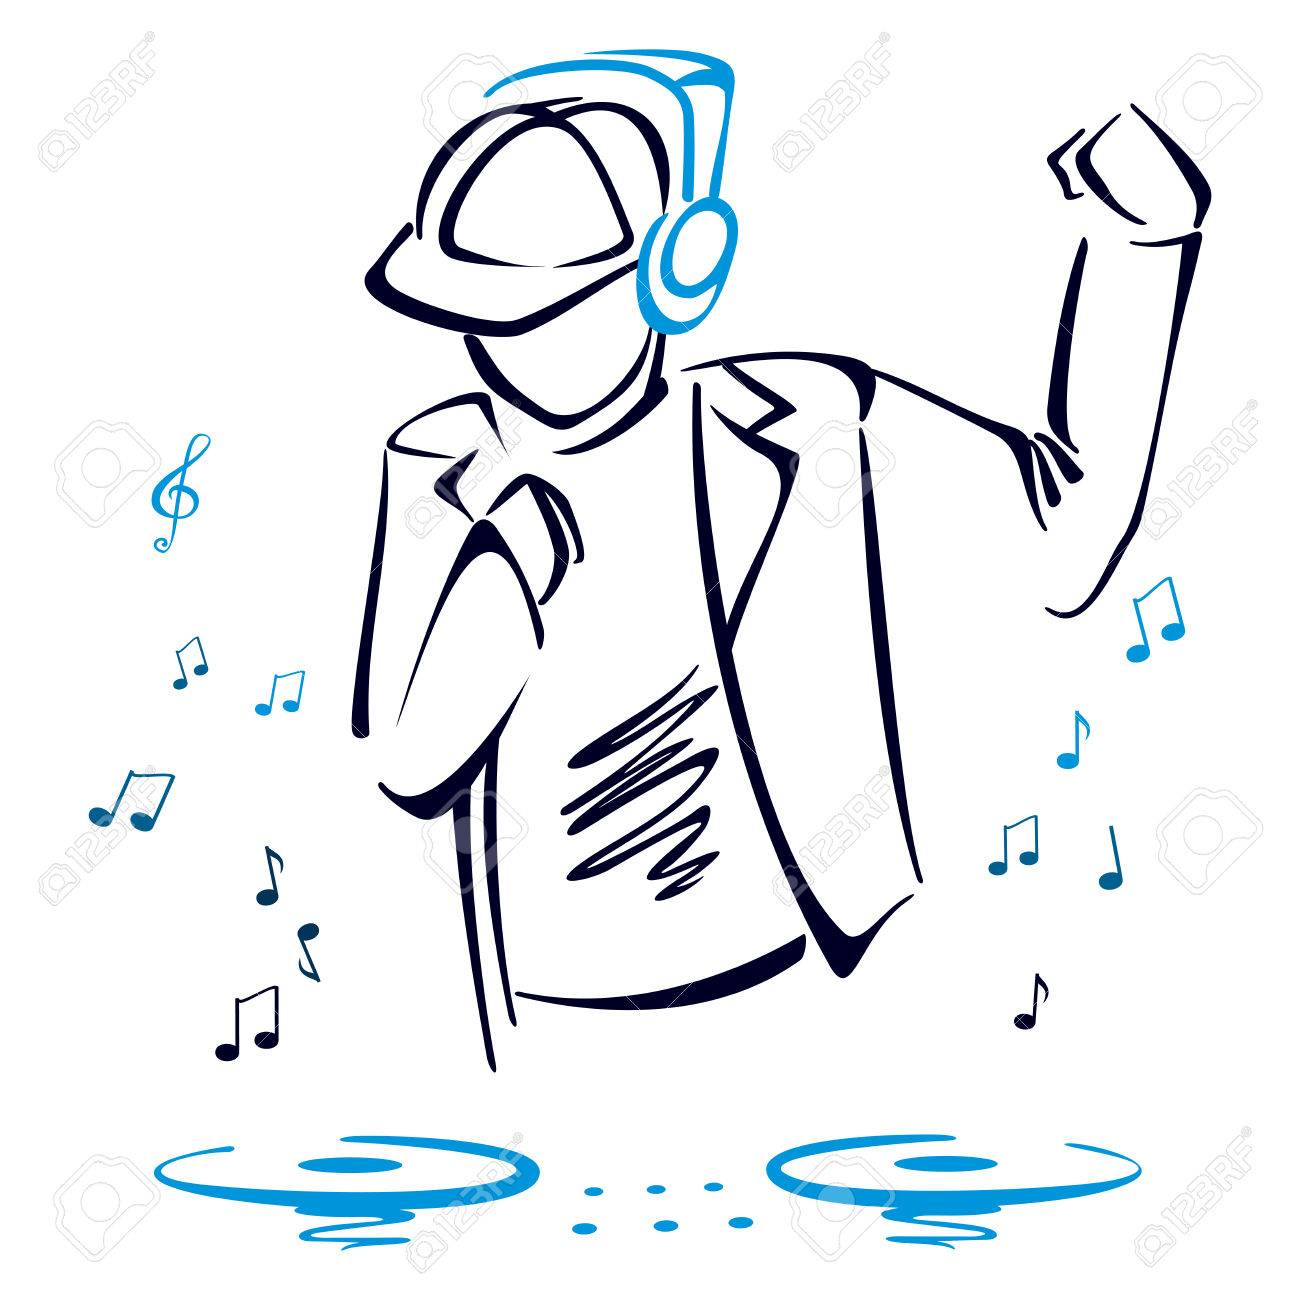 1300x1300 Dj Mixing Music Royalty Free Cliparts, Vectors, And Stock